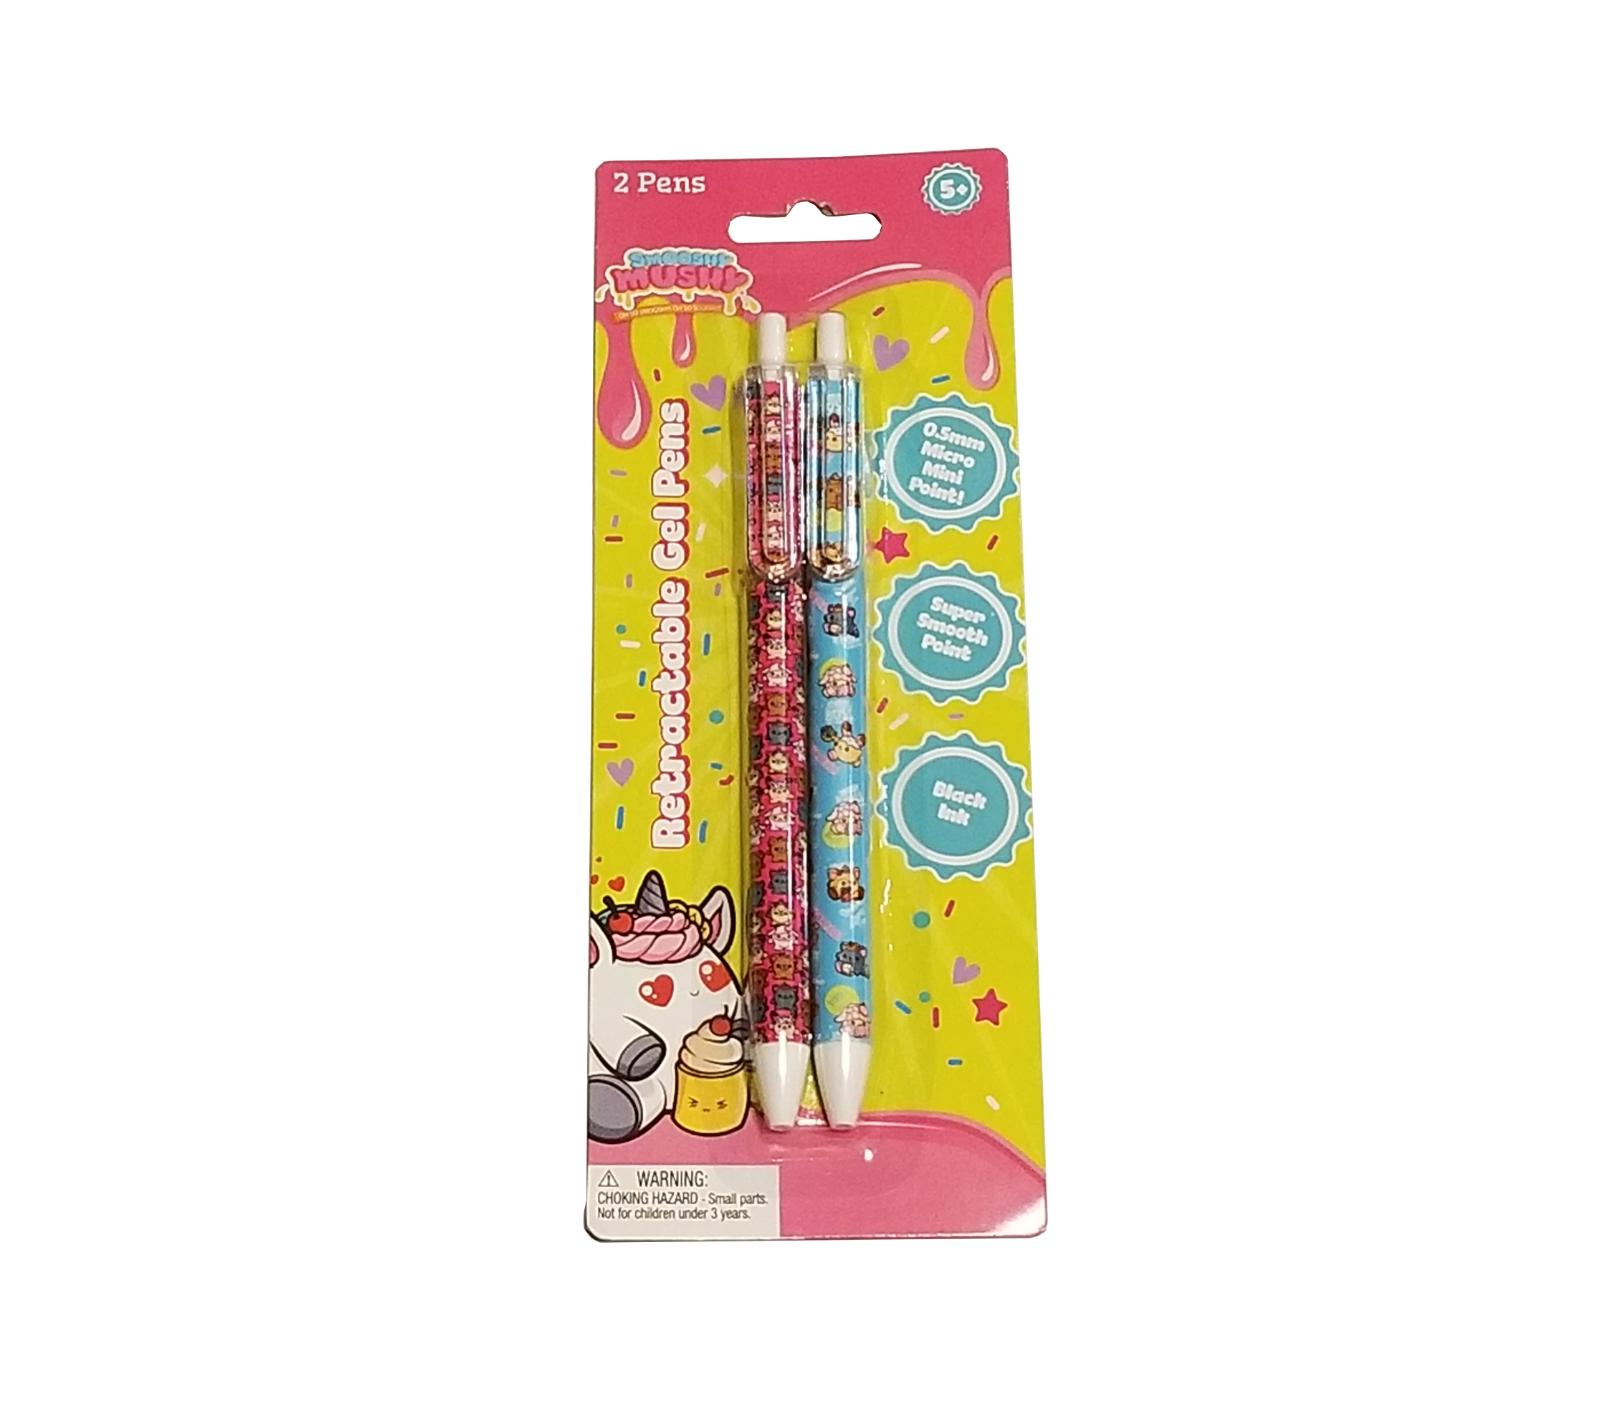 Smooshy Mushy 0.5mm Gel Pen 2 Pack (994-8) Back to School